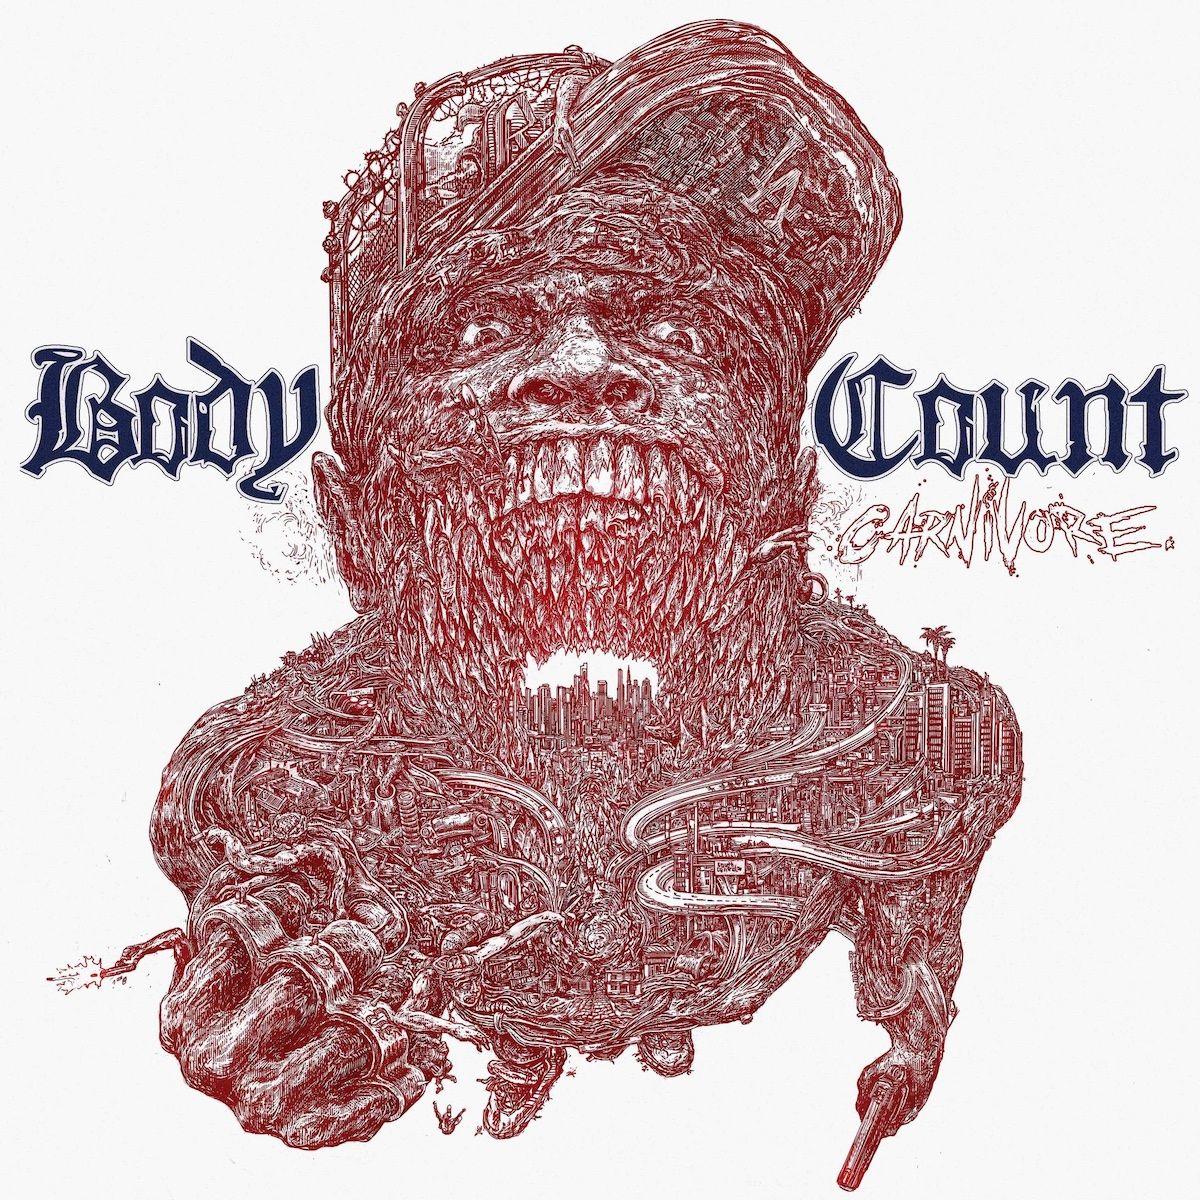 body-count-carnivore.jpg